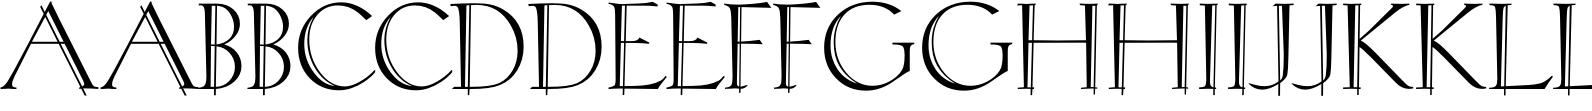 Rivoli Initials